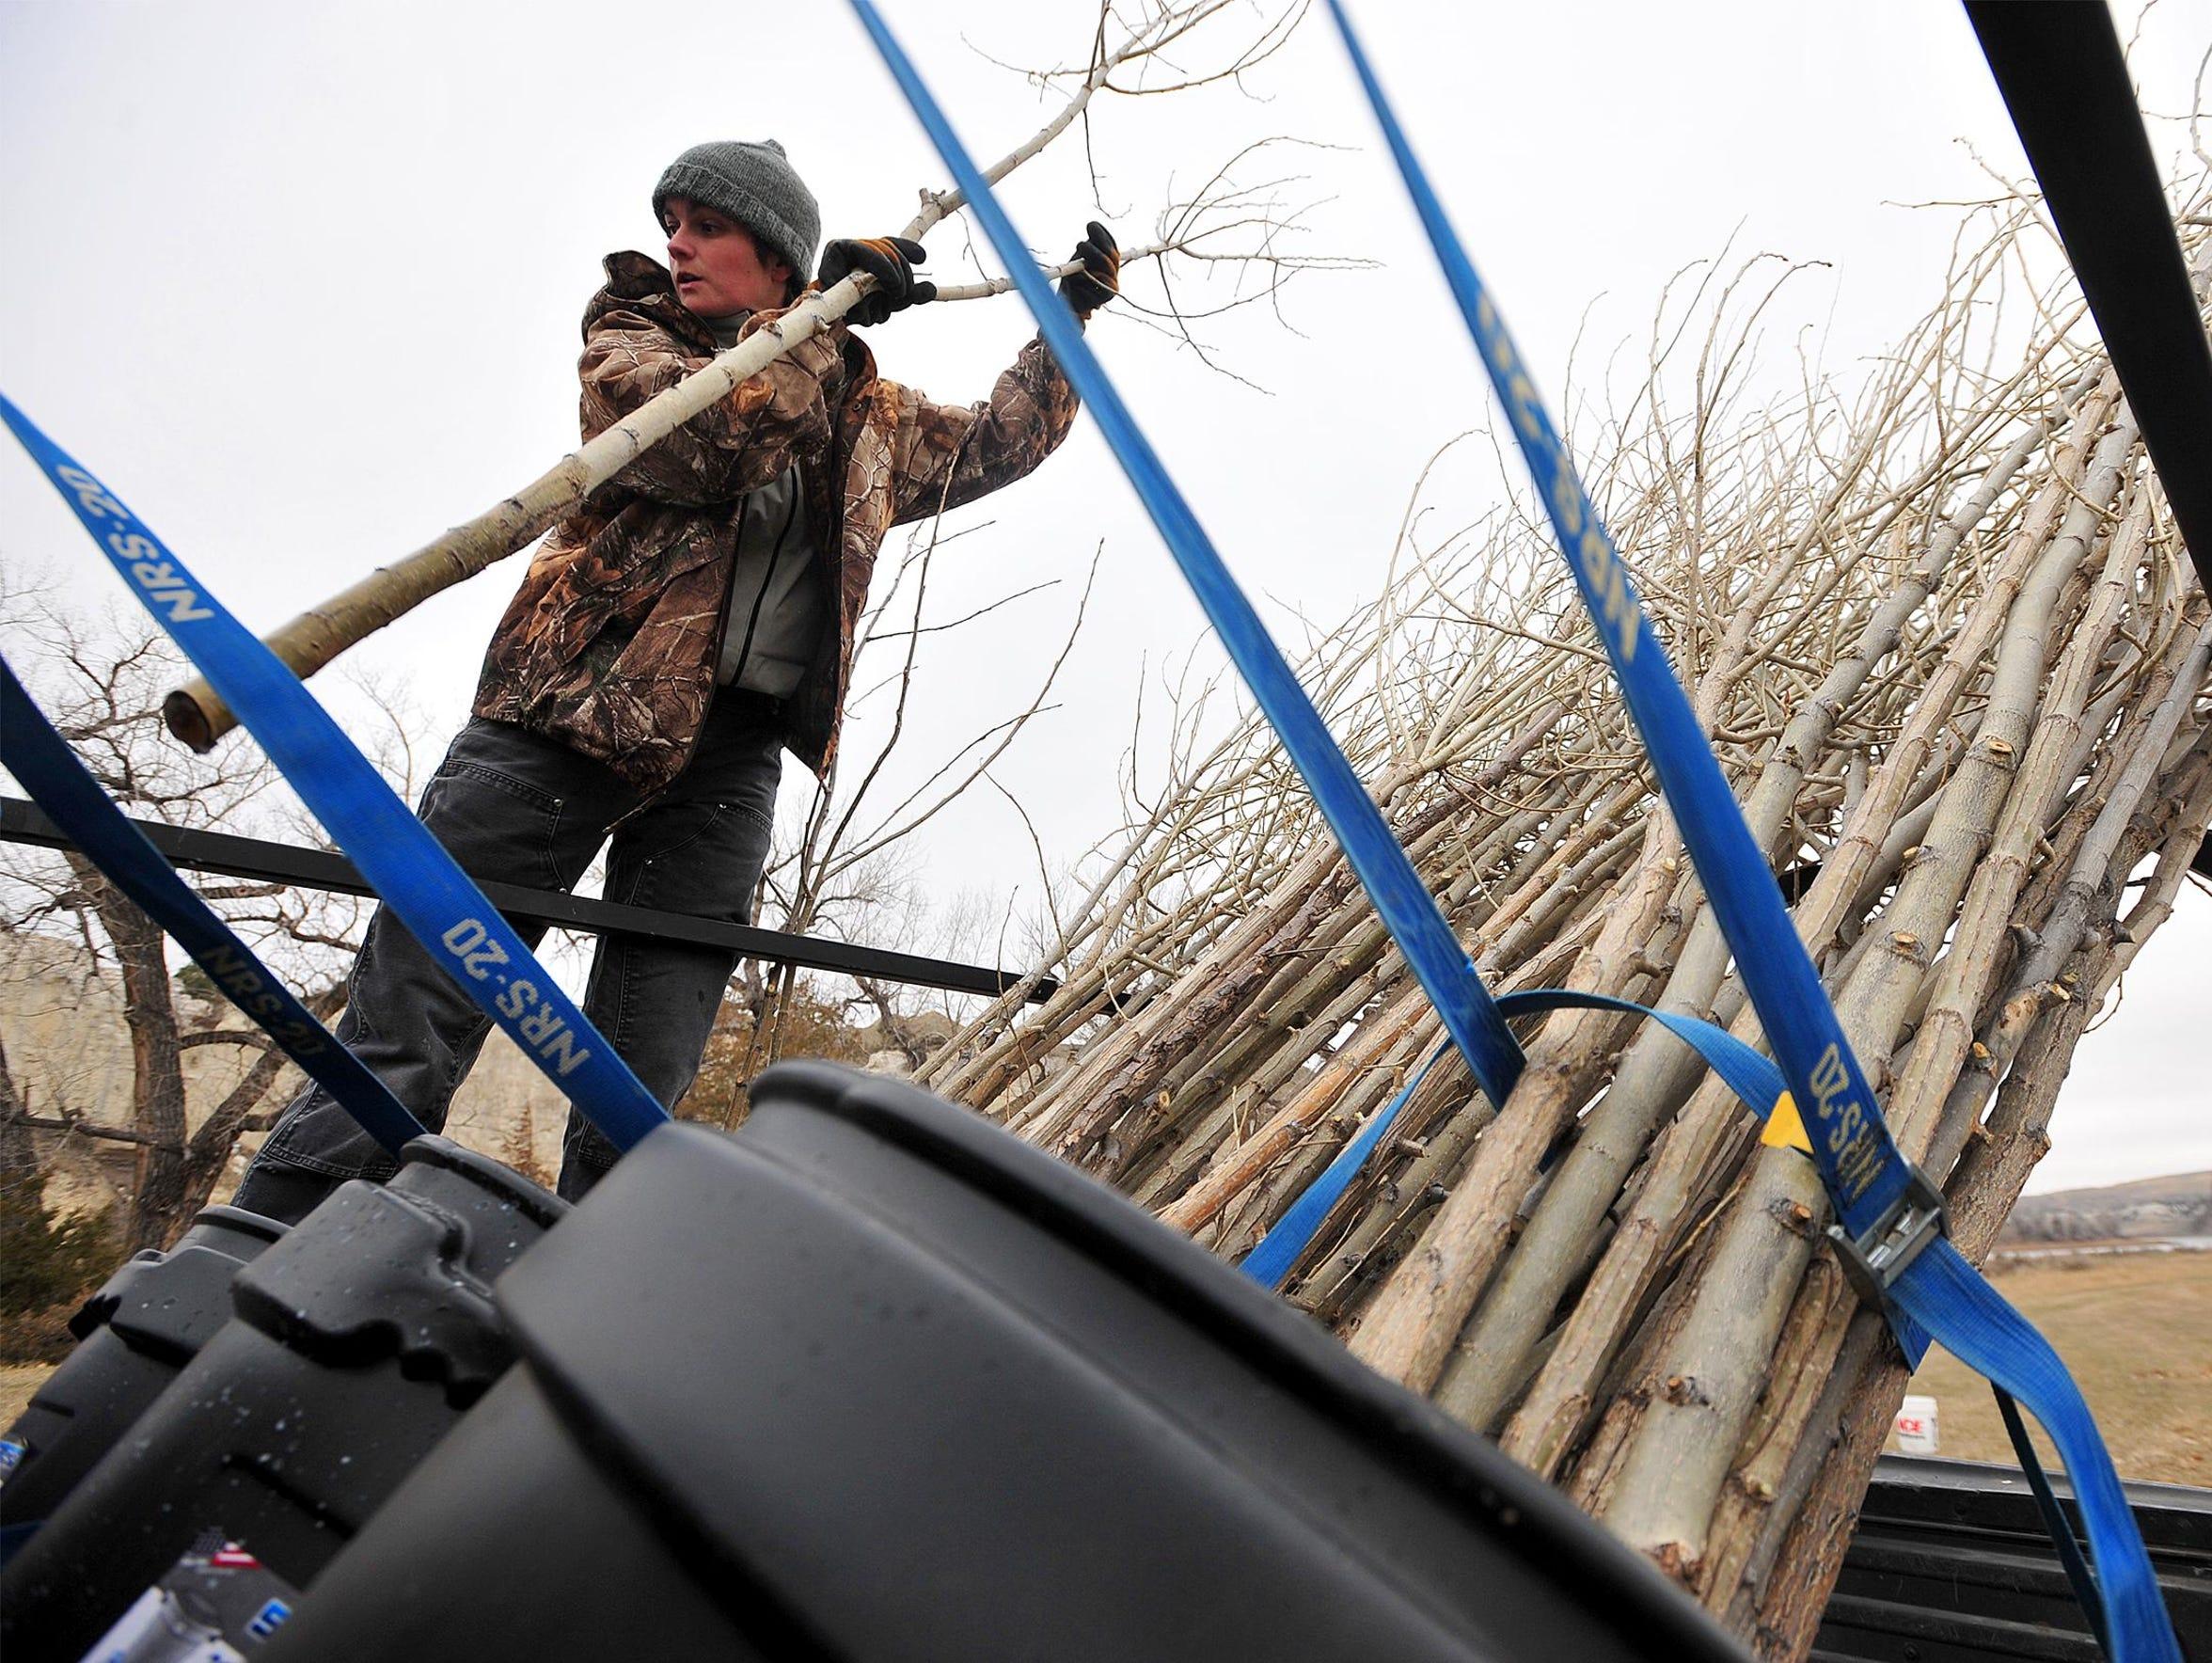 Robin McQuinn, a volunteer from Billings, unloads cottonwood